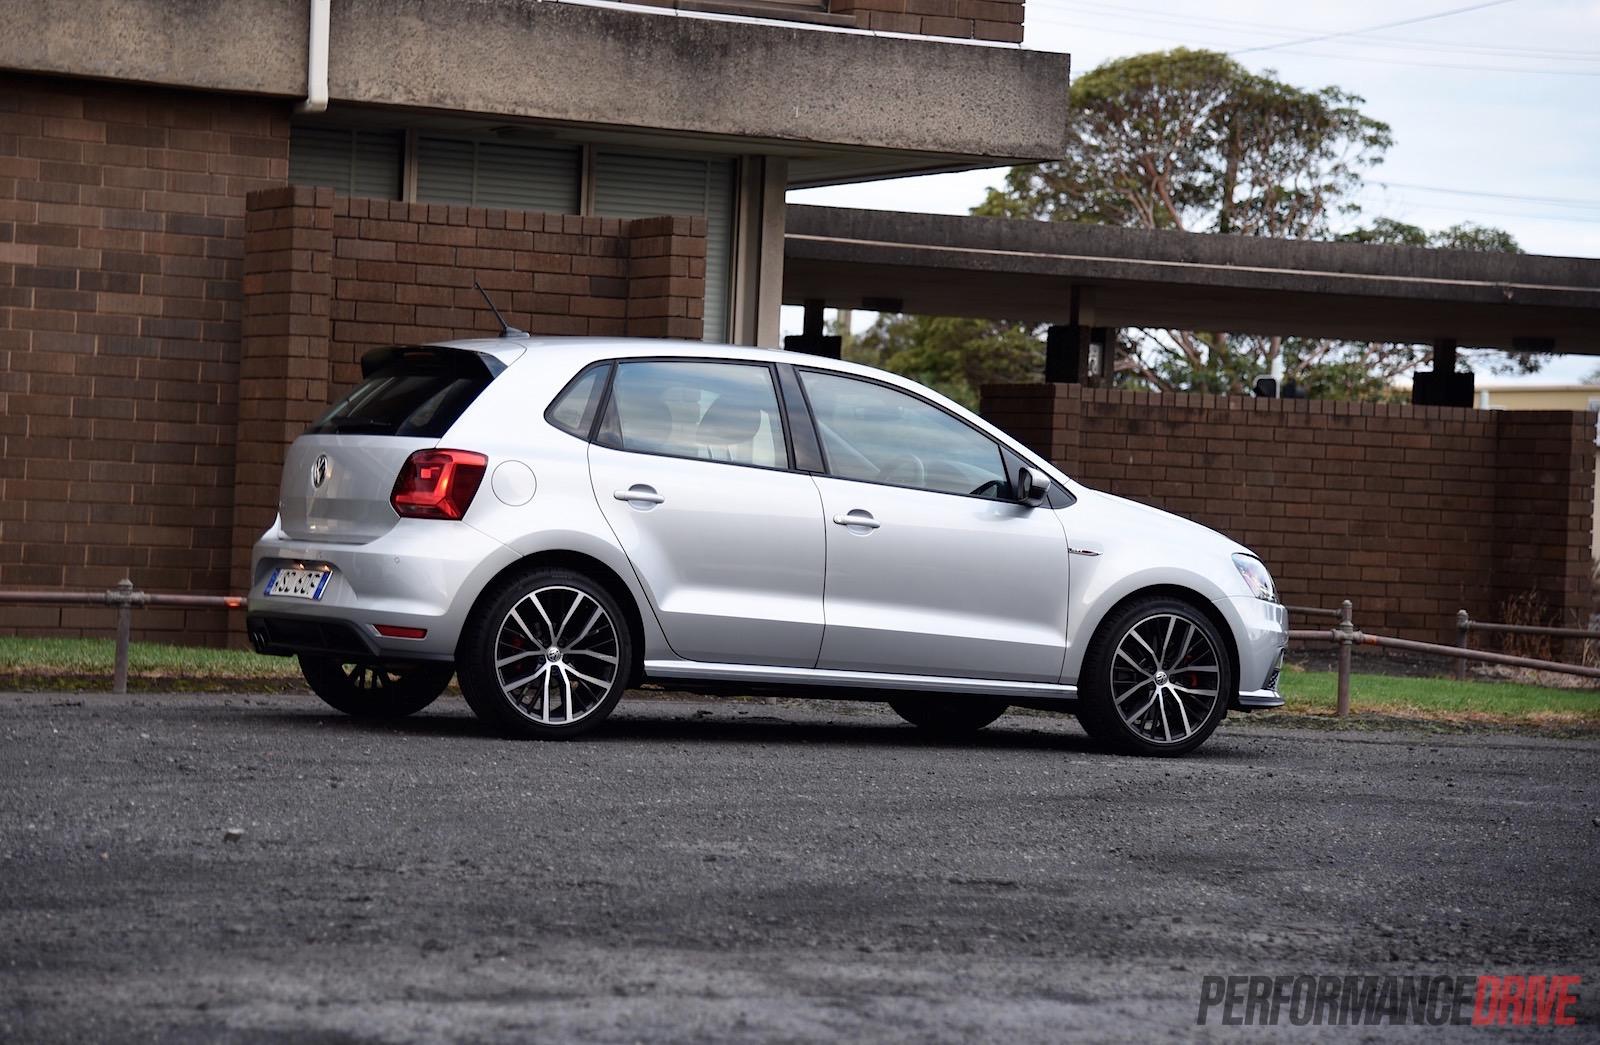 2015 Volkswagen Polo Gti Review Video Performancedrive